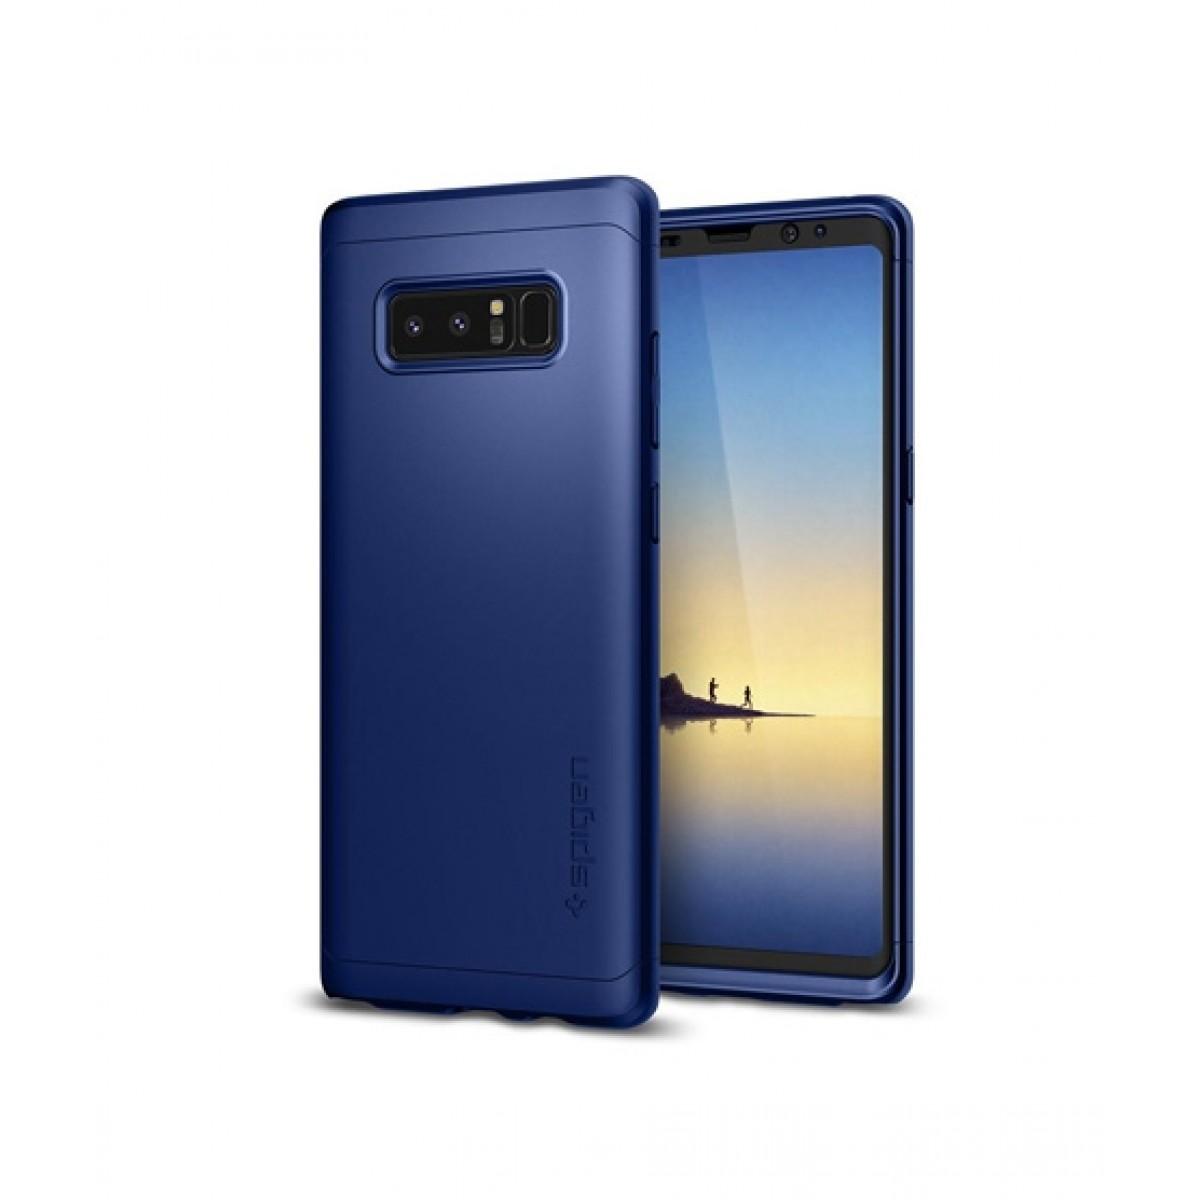 hot sale online abeee 79a89 Spigen Thin Fit 360 Deep Sea Blue Case For Galaxy Note 8